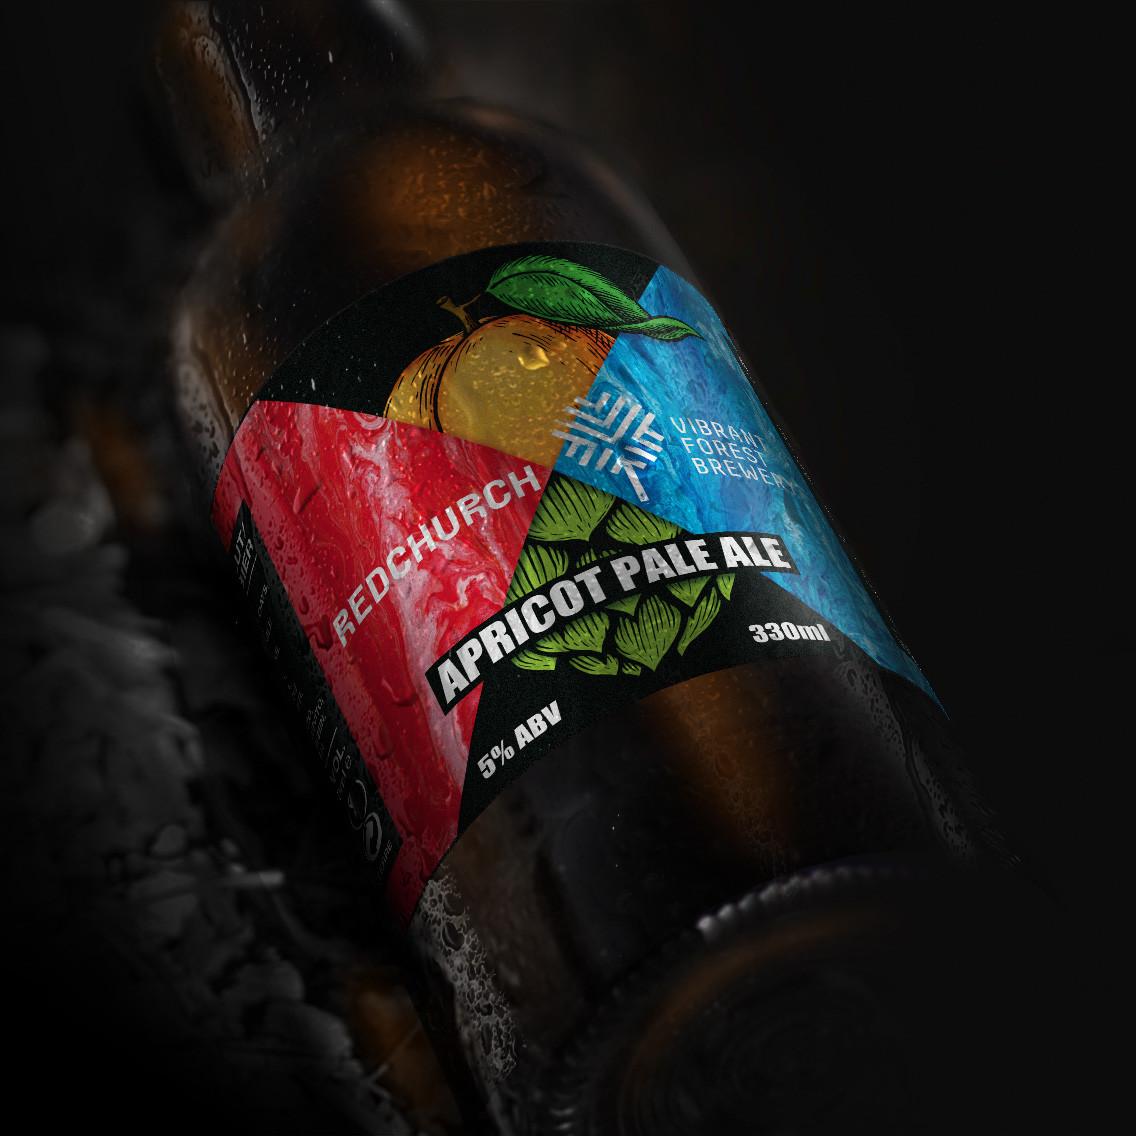 Redchurch Apricot Pale Ale Label Design